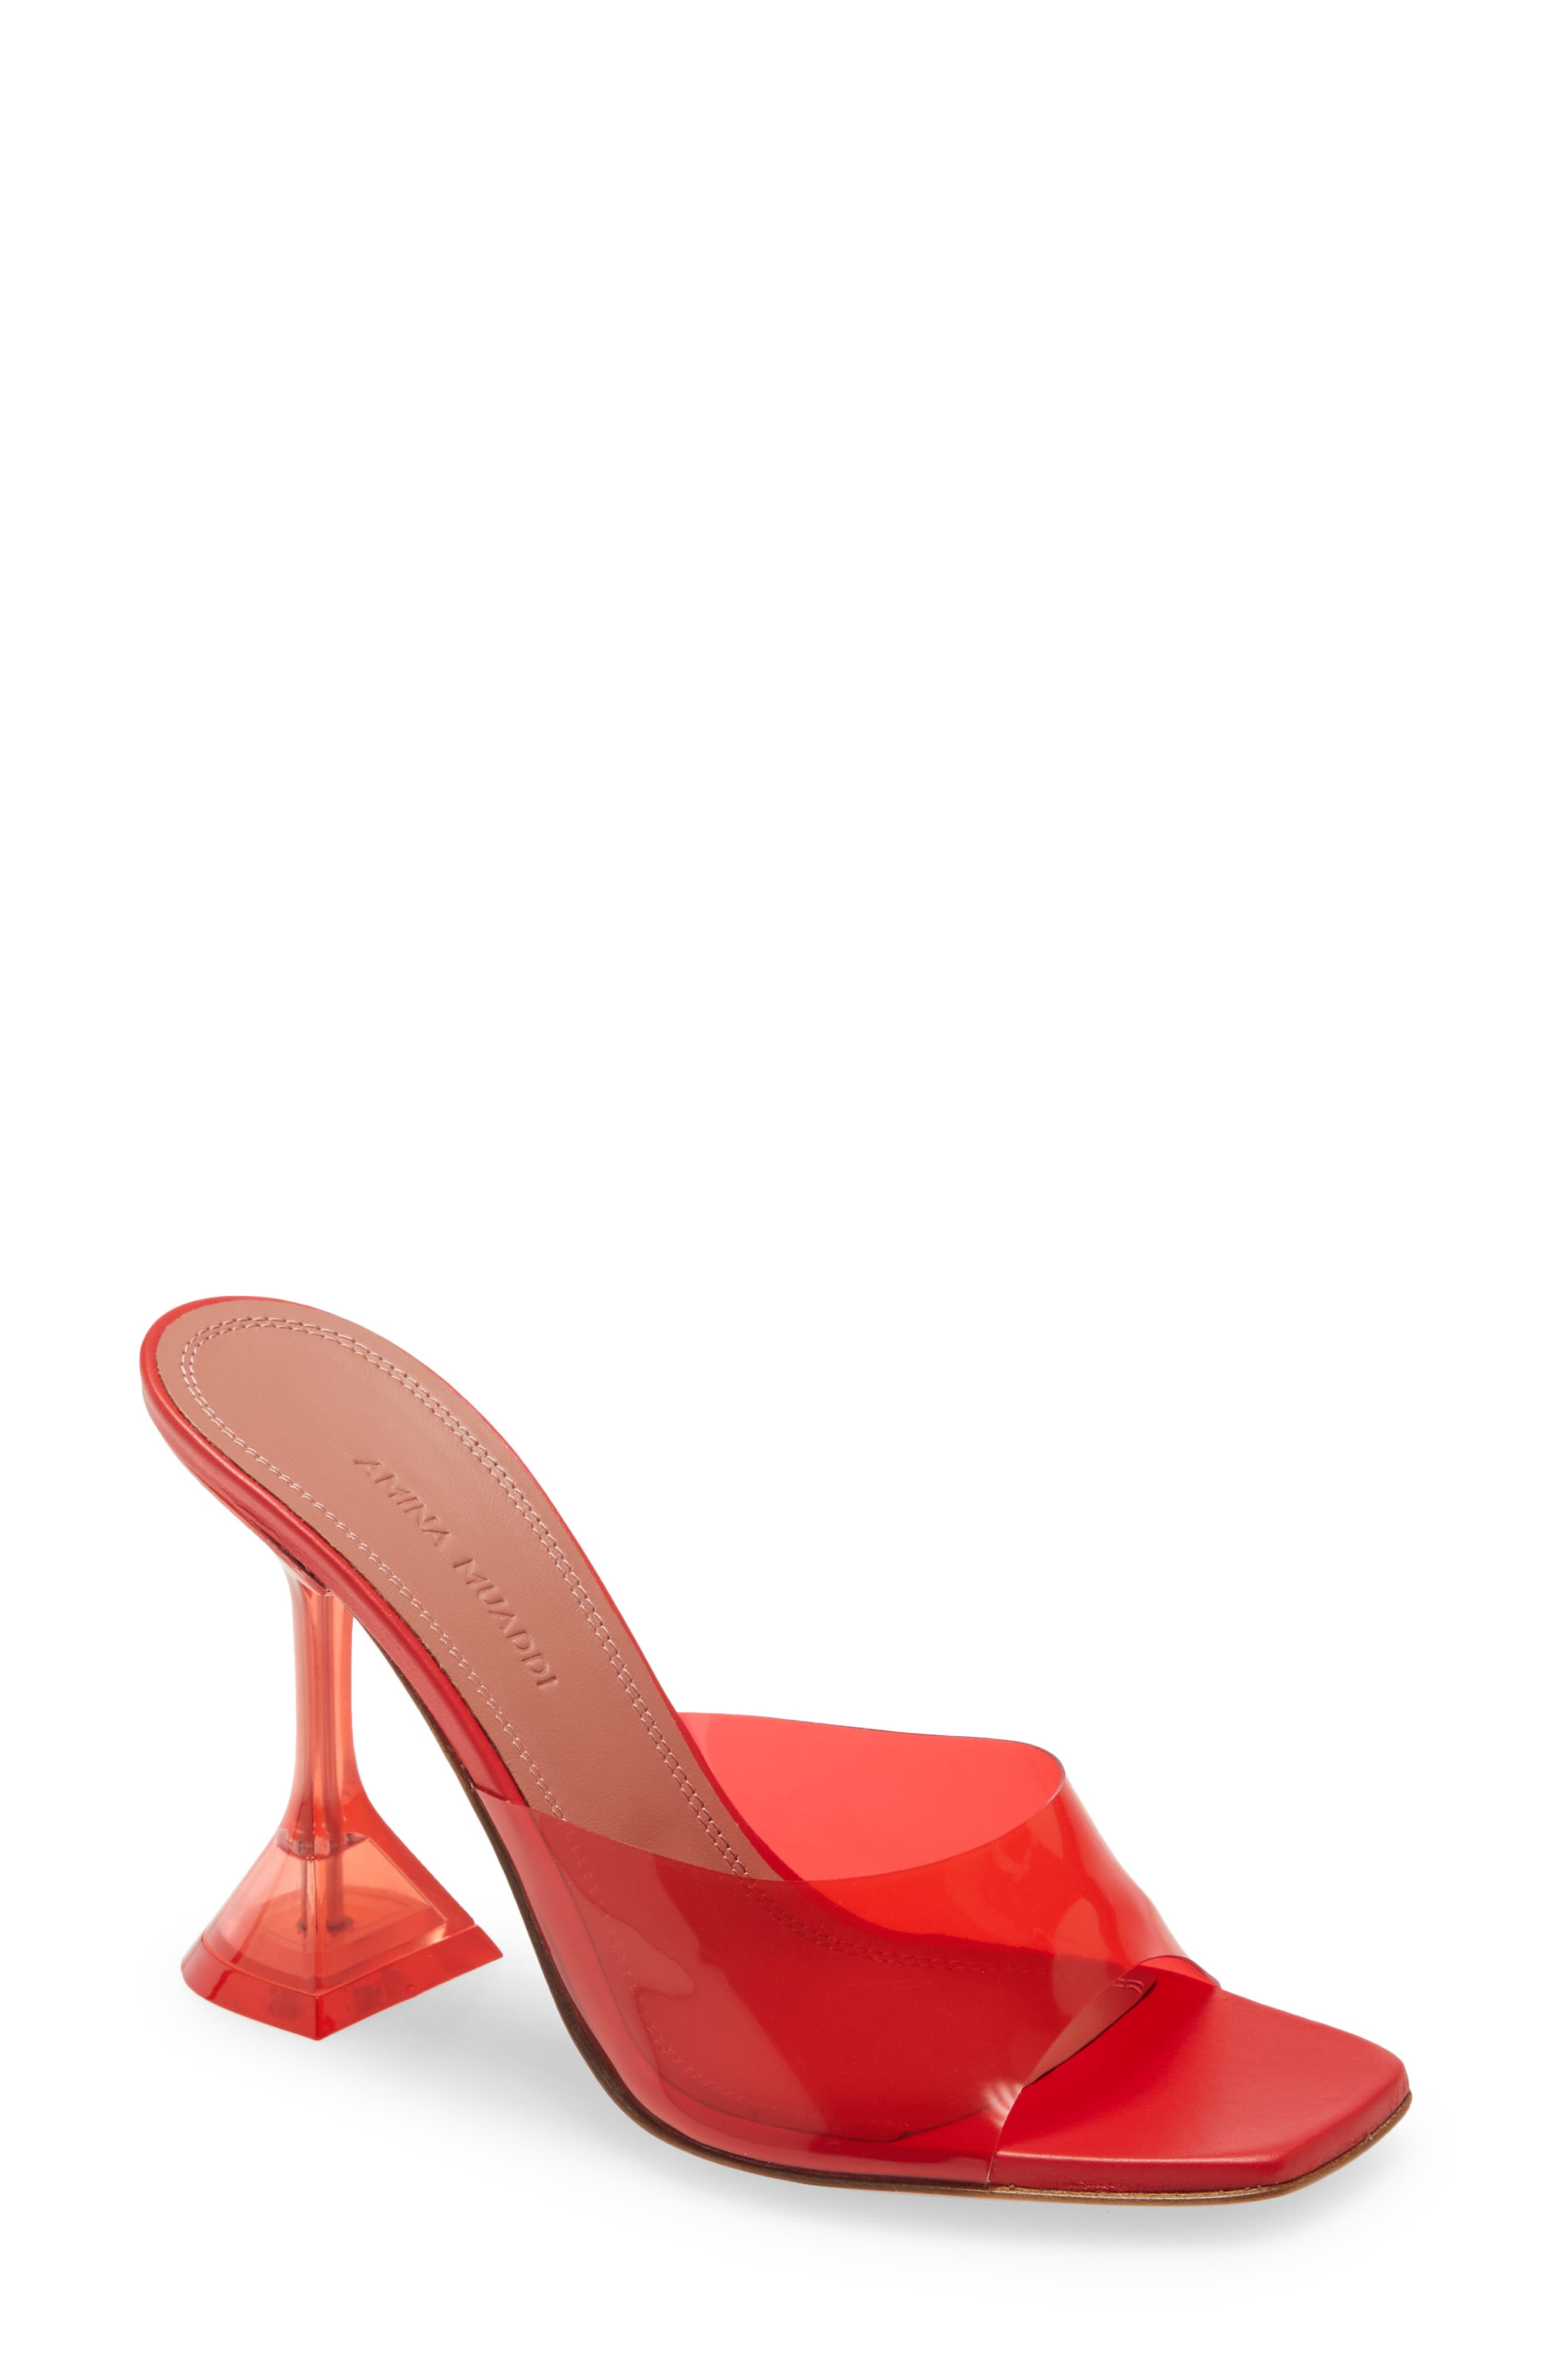 Women's Red Sandals and Flip-Flops